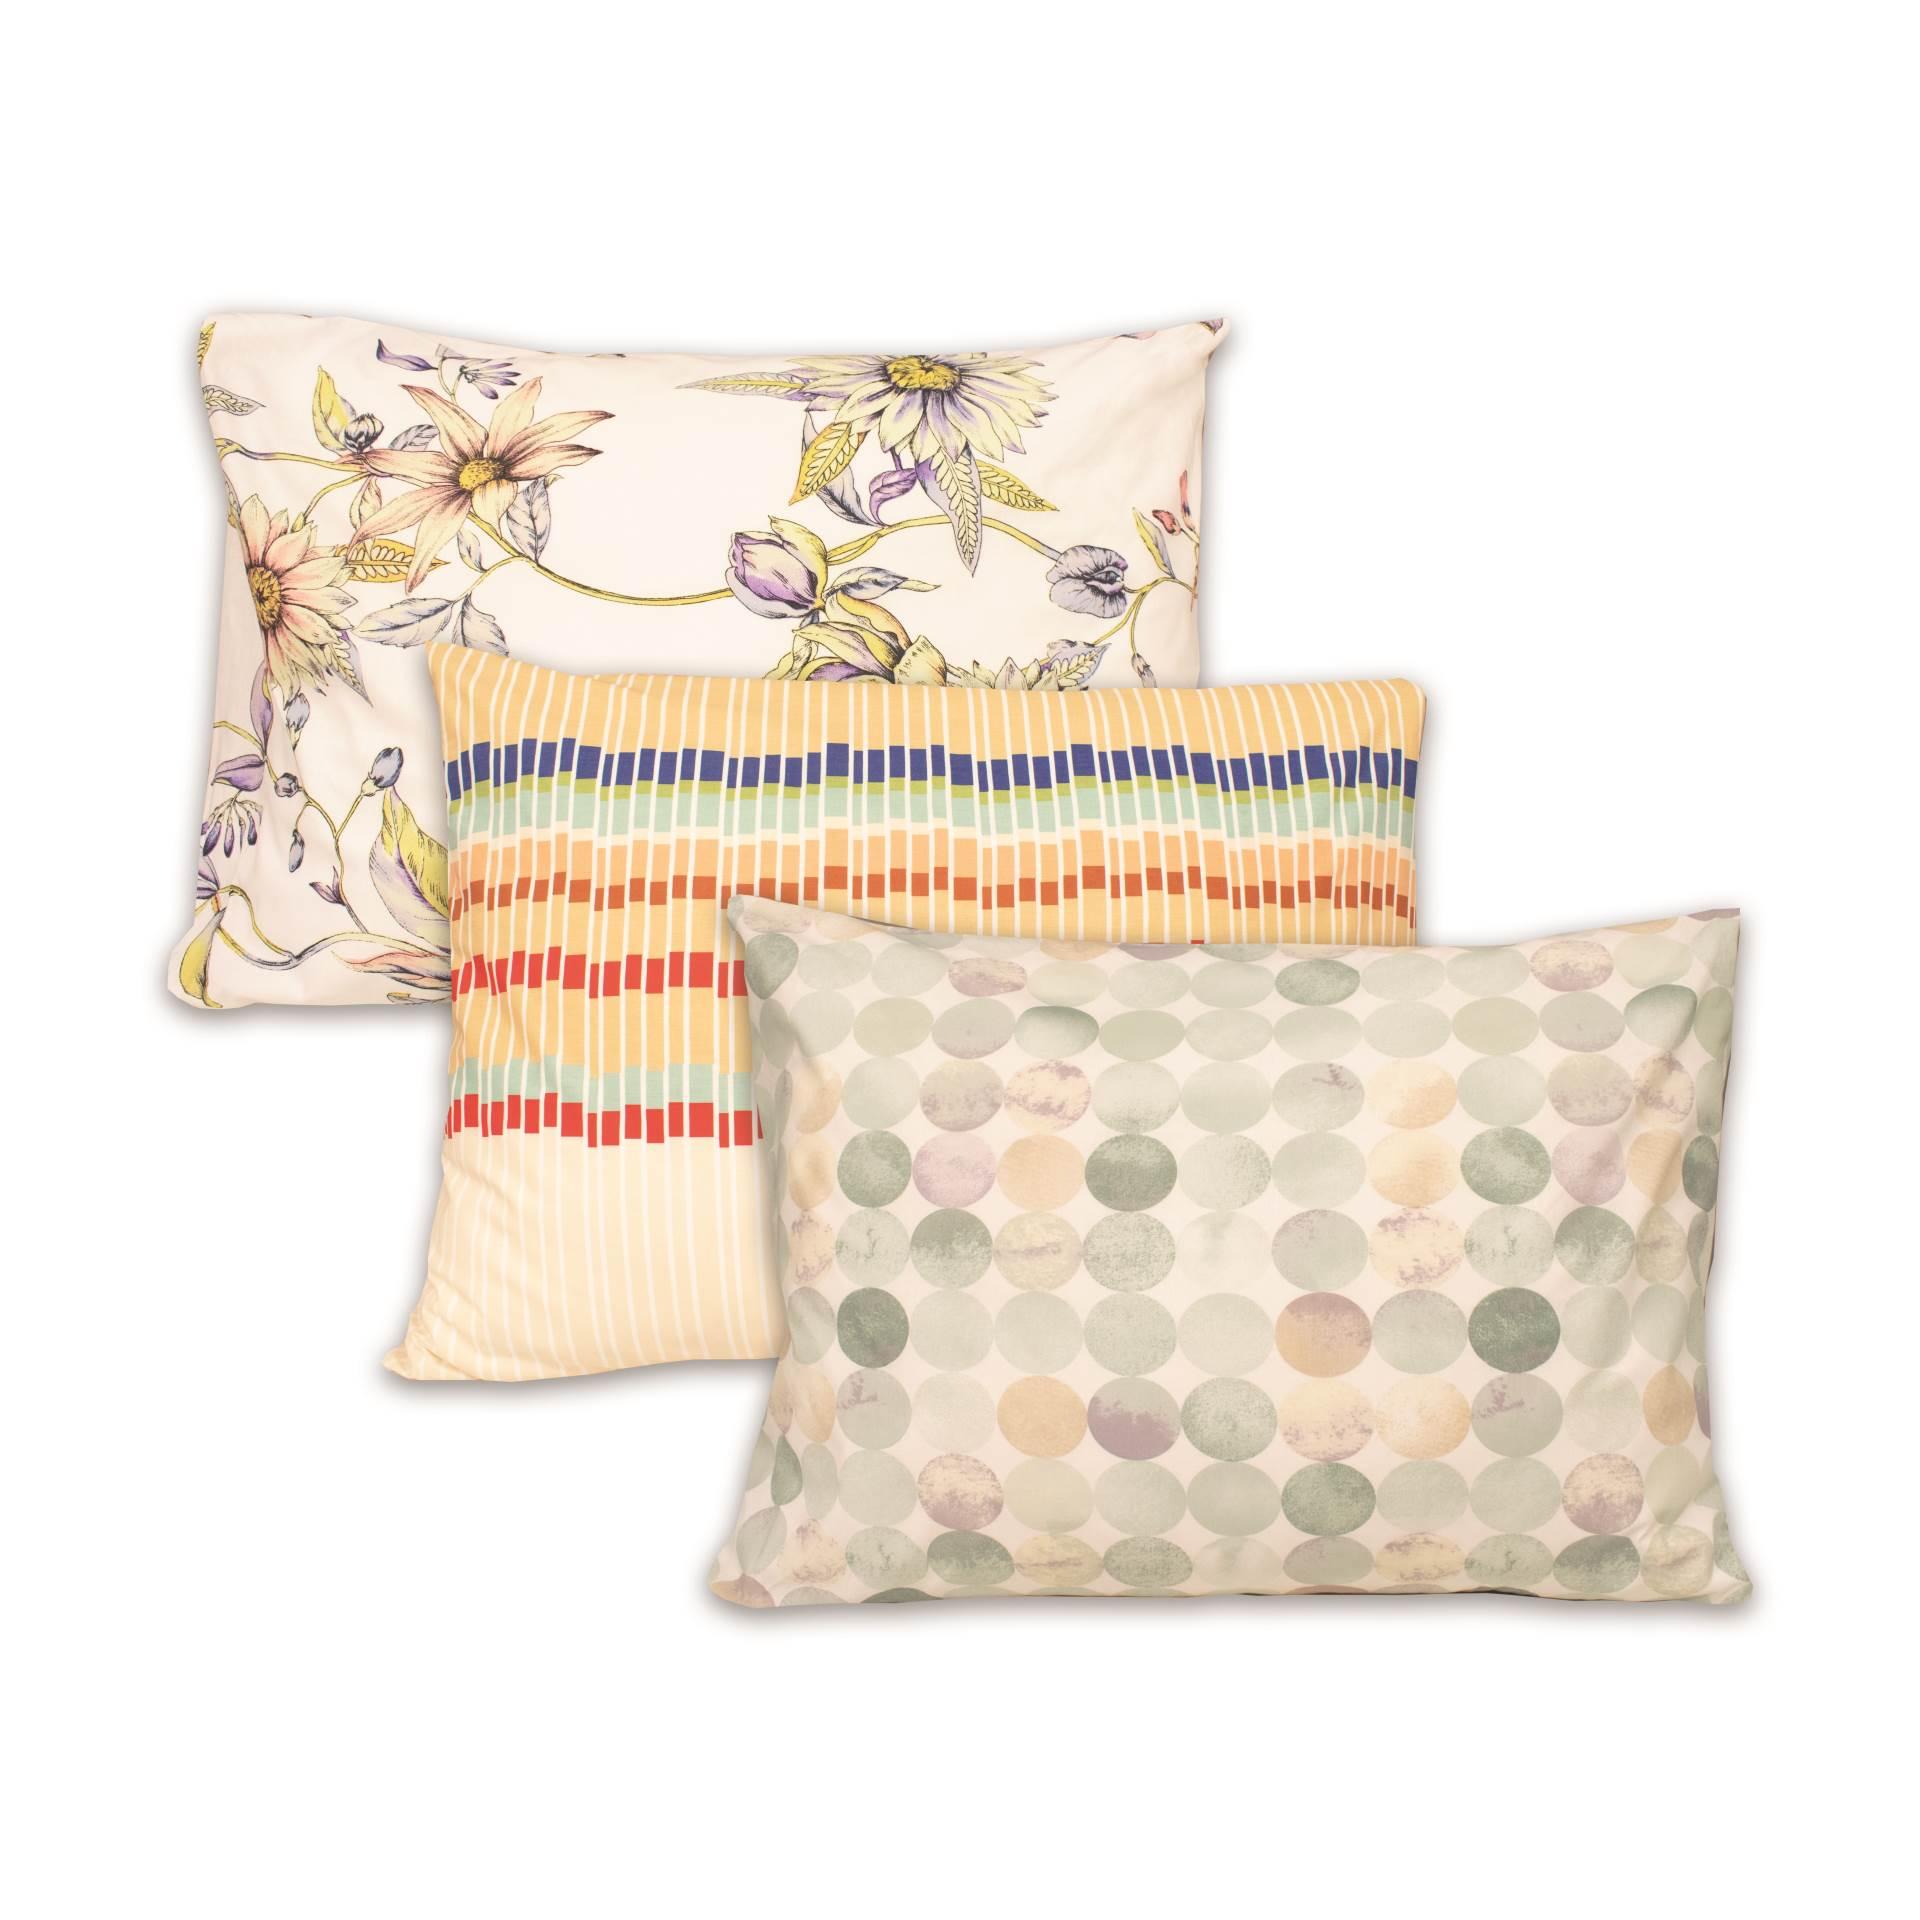 AGAVA jastučnice, 13,45 kn